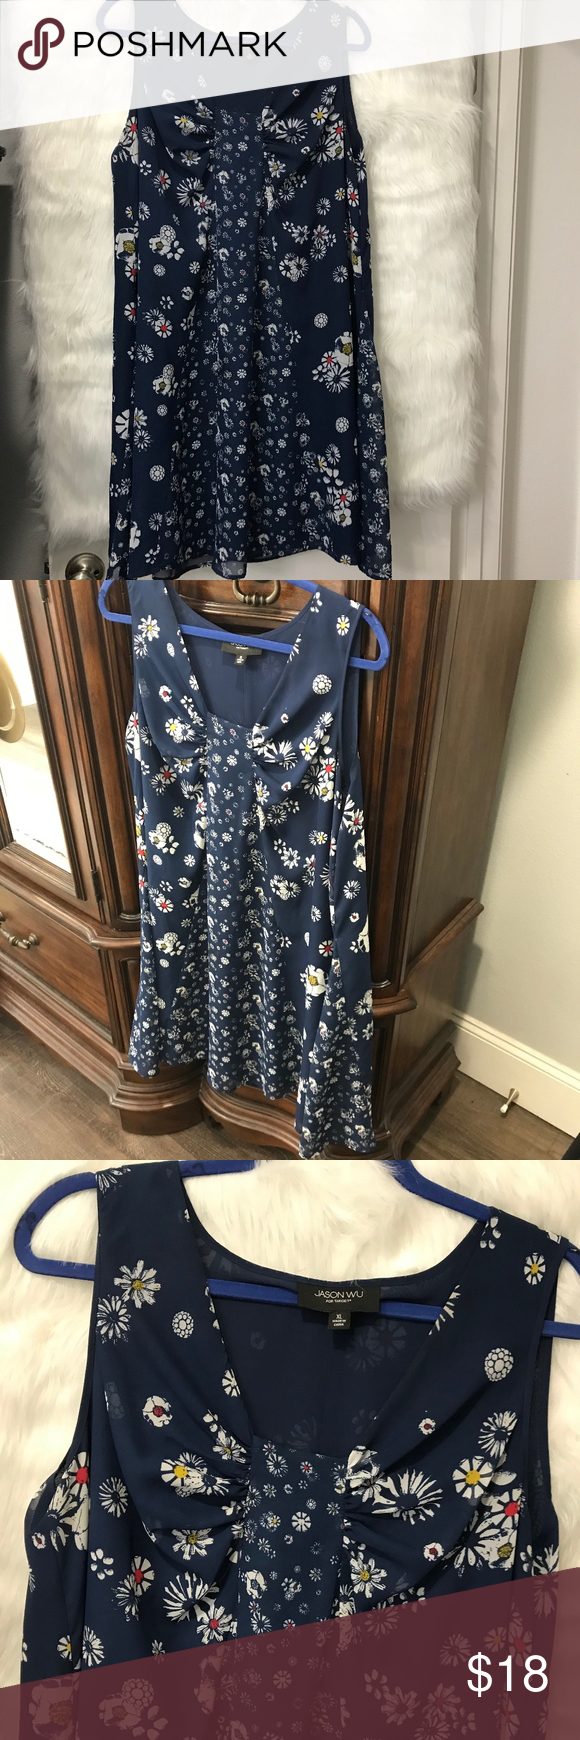 Jason Wu For Target Blue Floral Dress Floral Blue Dress Clothes Design Floral Dress [ 1740 x 580 Pixel ]